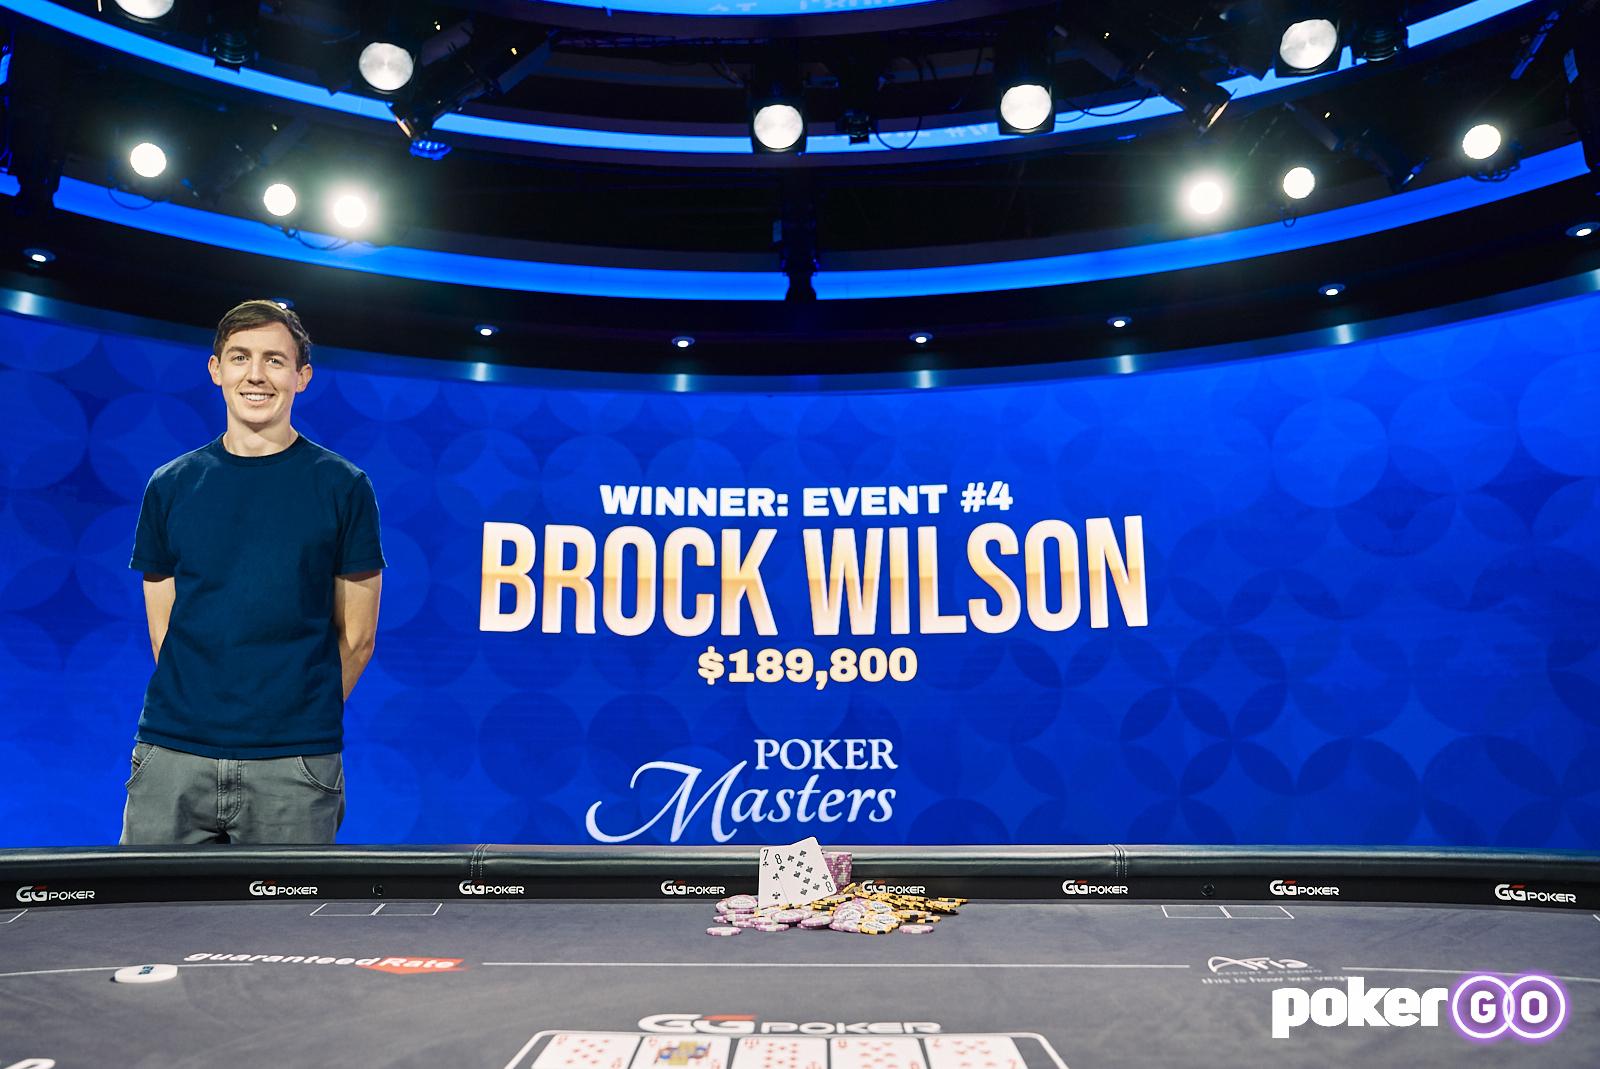 Poker Masters 2021 - Brock Wilson